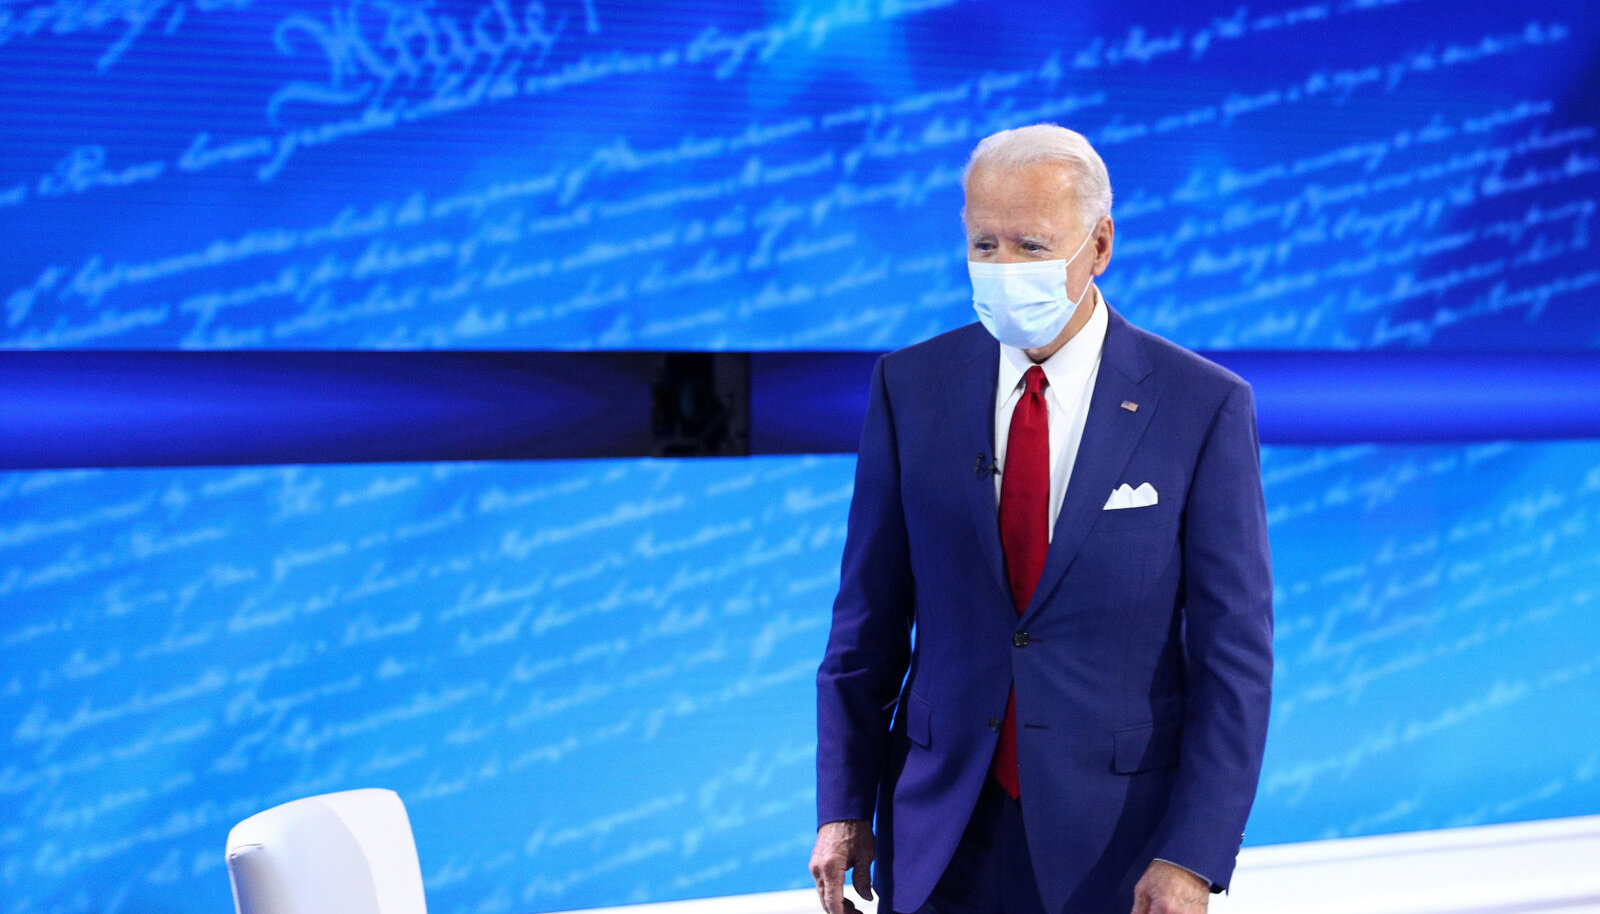 USA presidendiks pürgiv Joe Biden